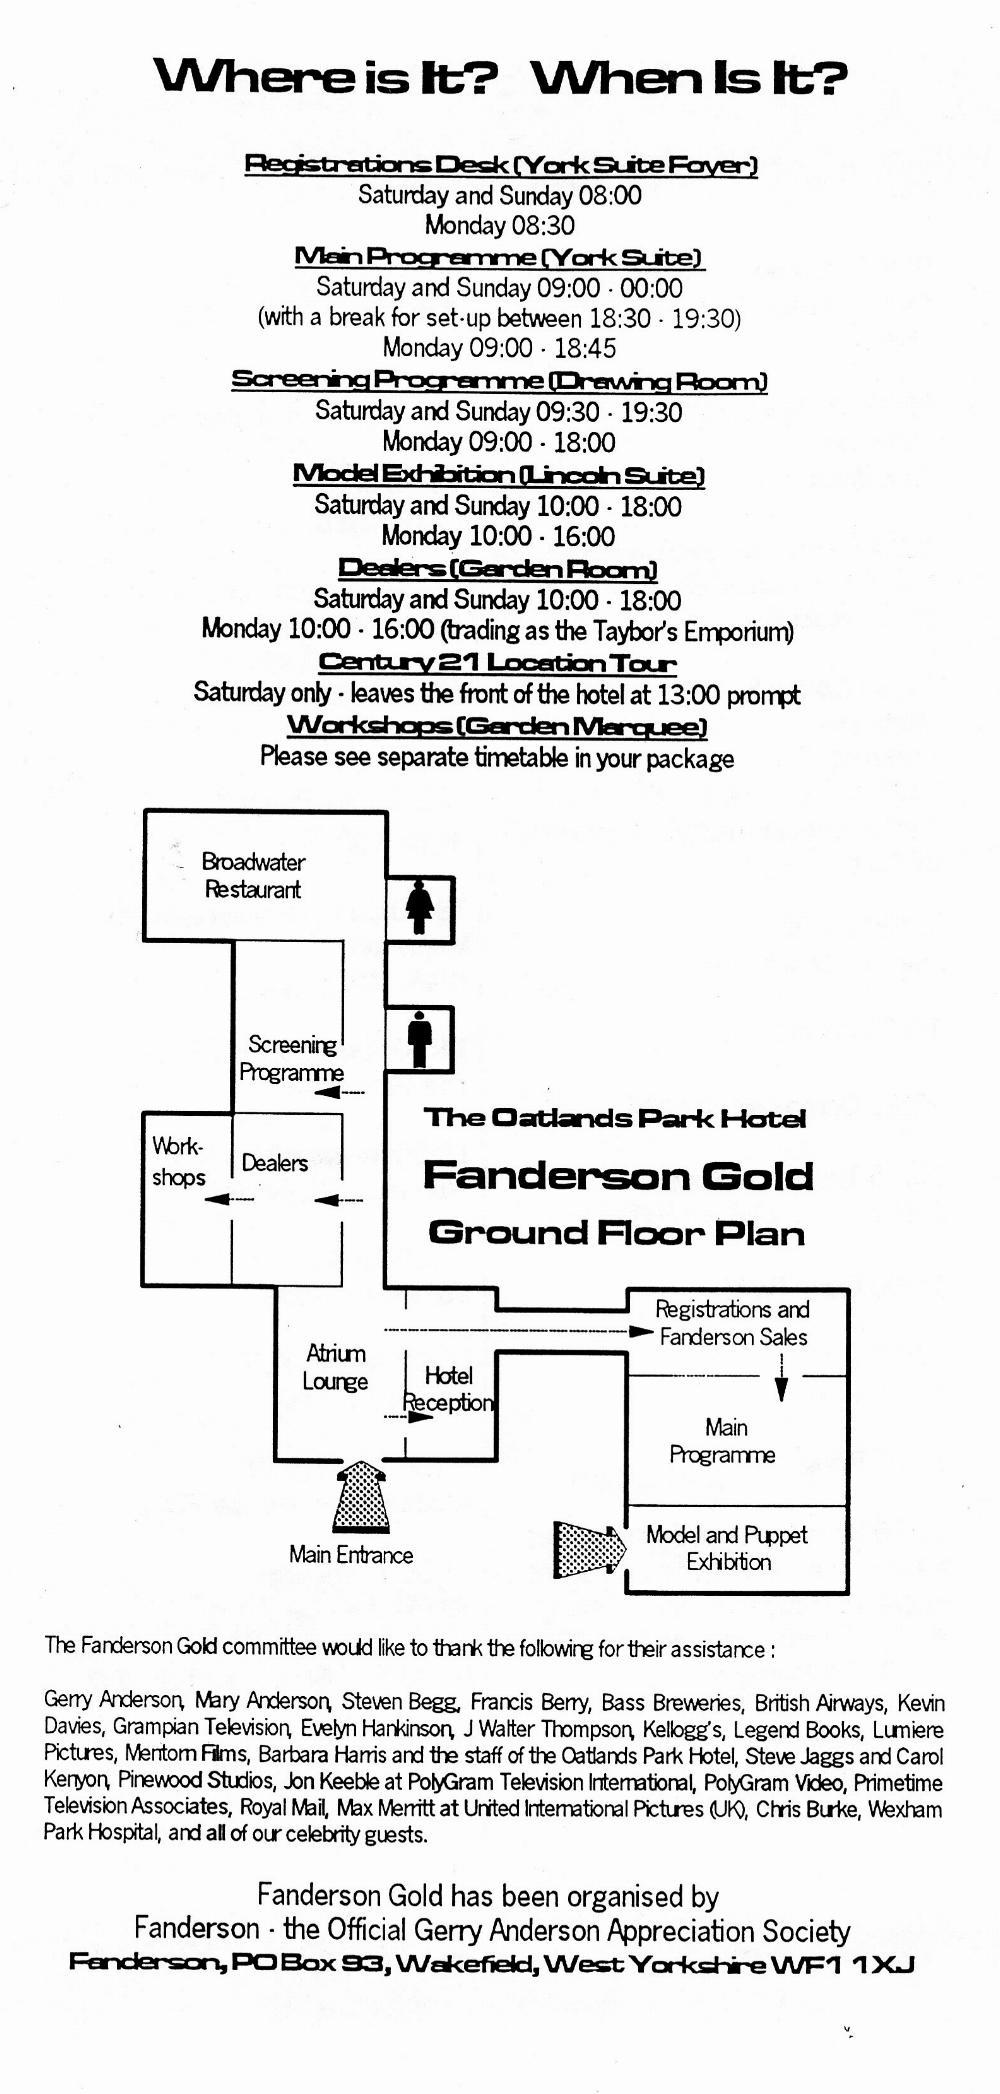 Fanderson Gold